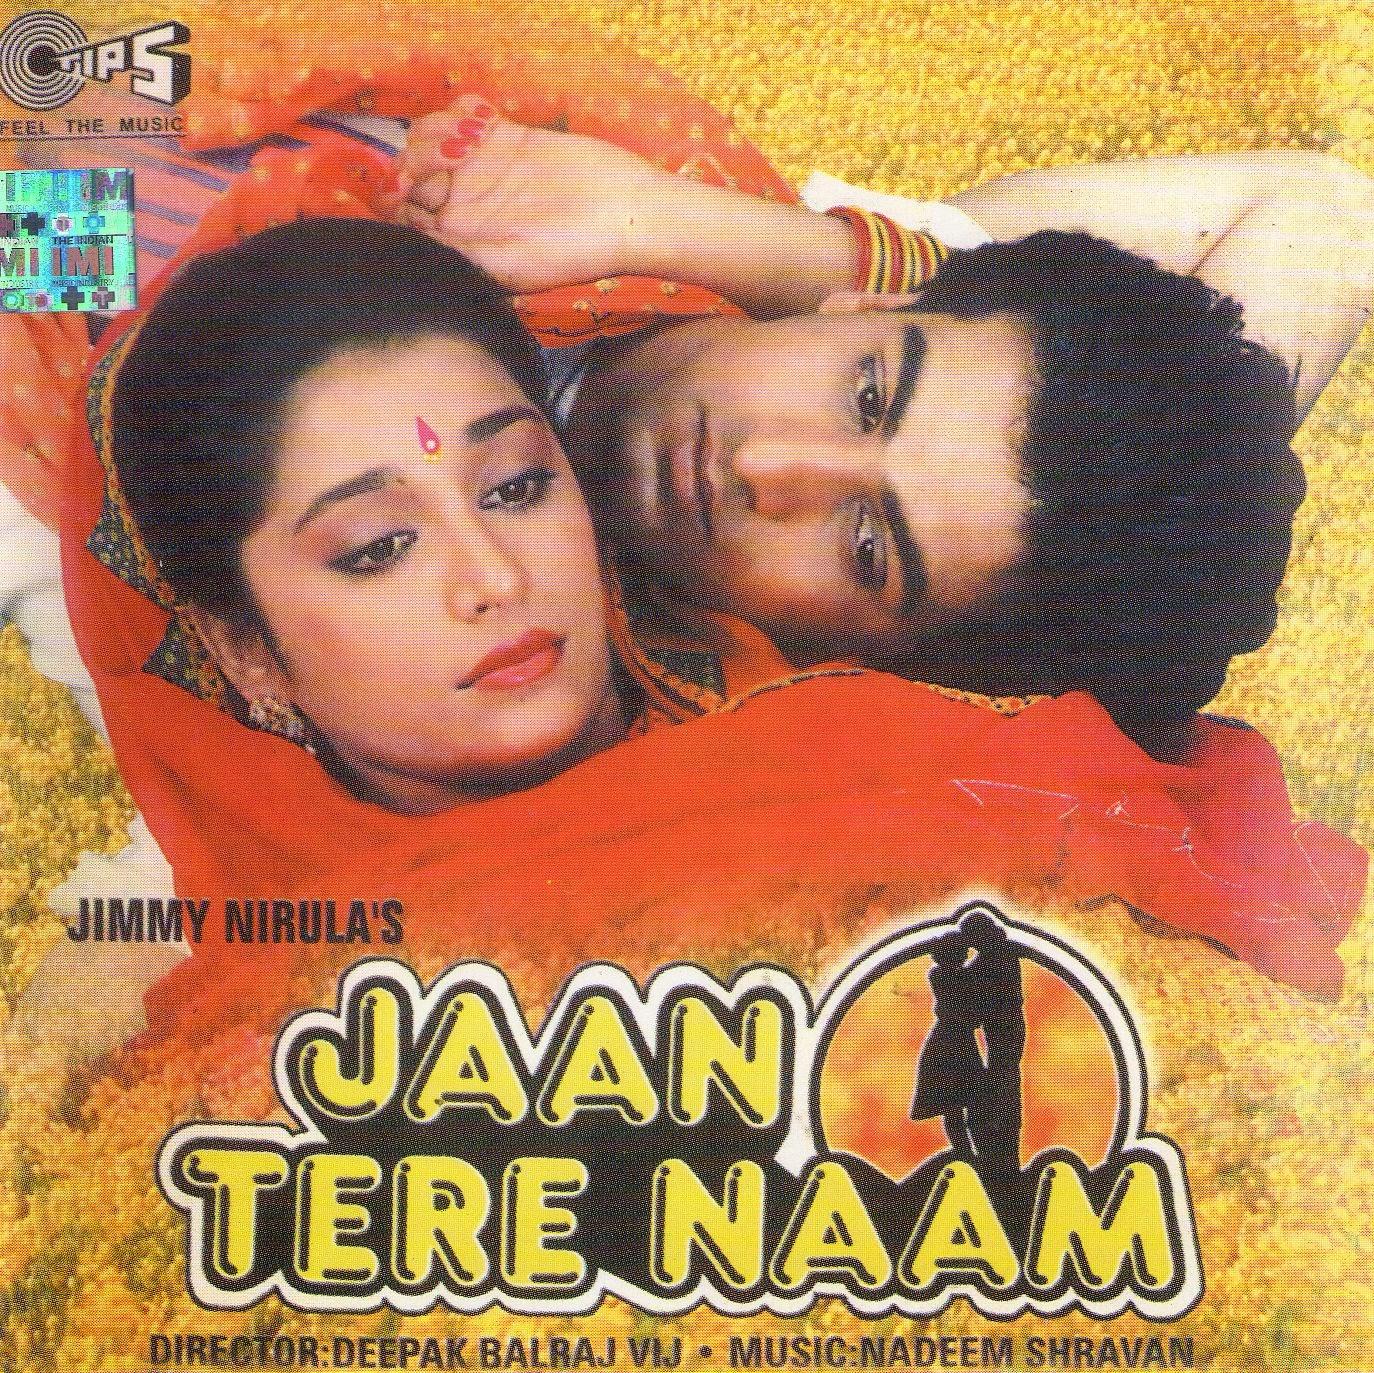 Tere Lak Te Karachi Mp3 Songs: Kumar Sanu King Of Romance Mp3